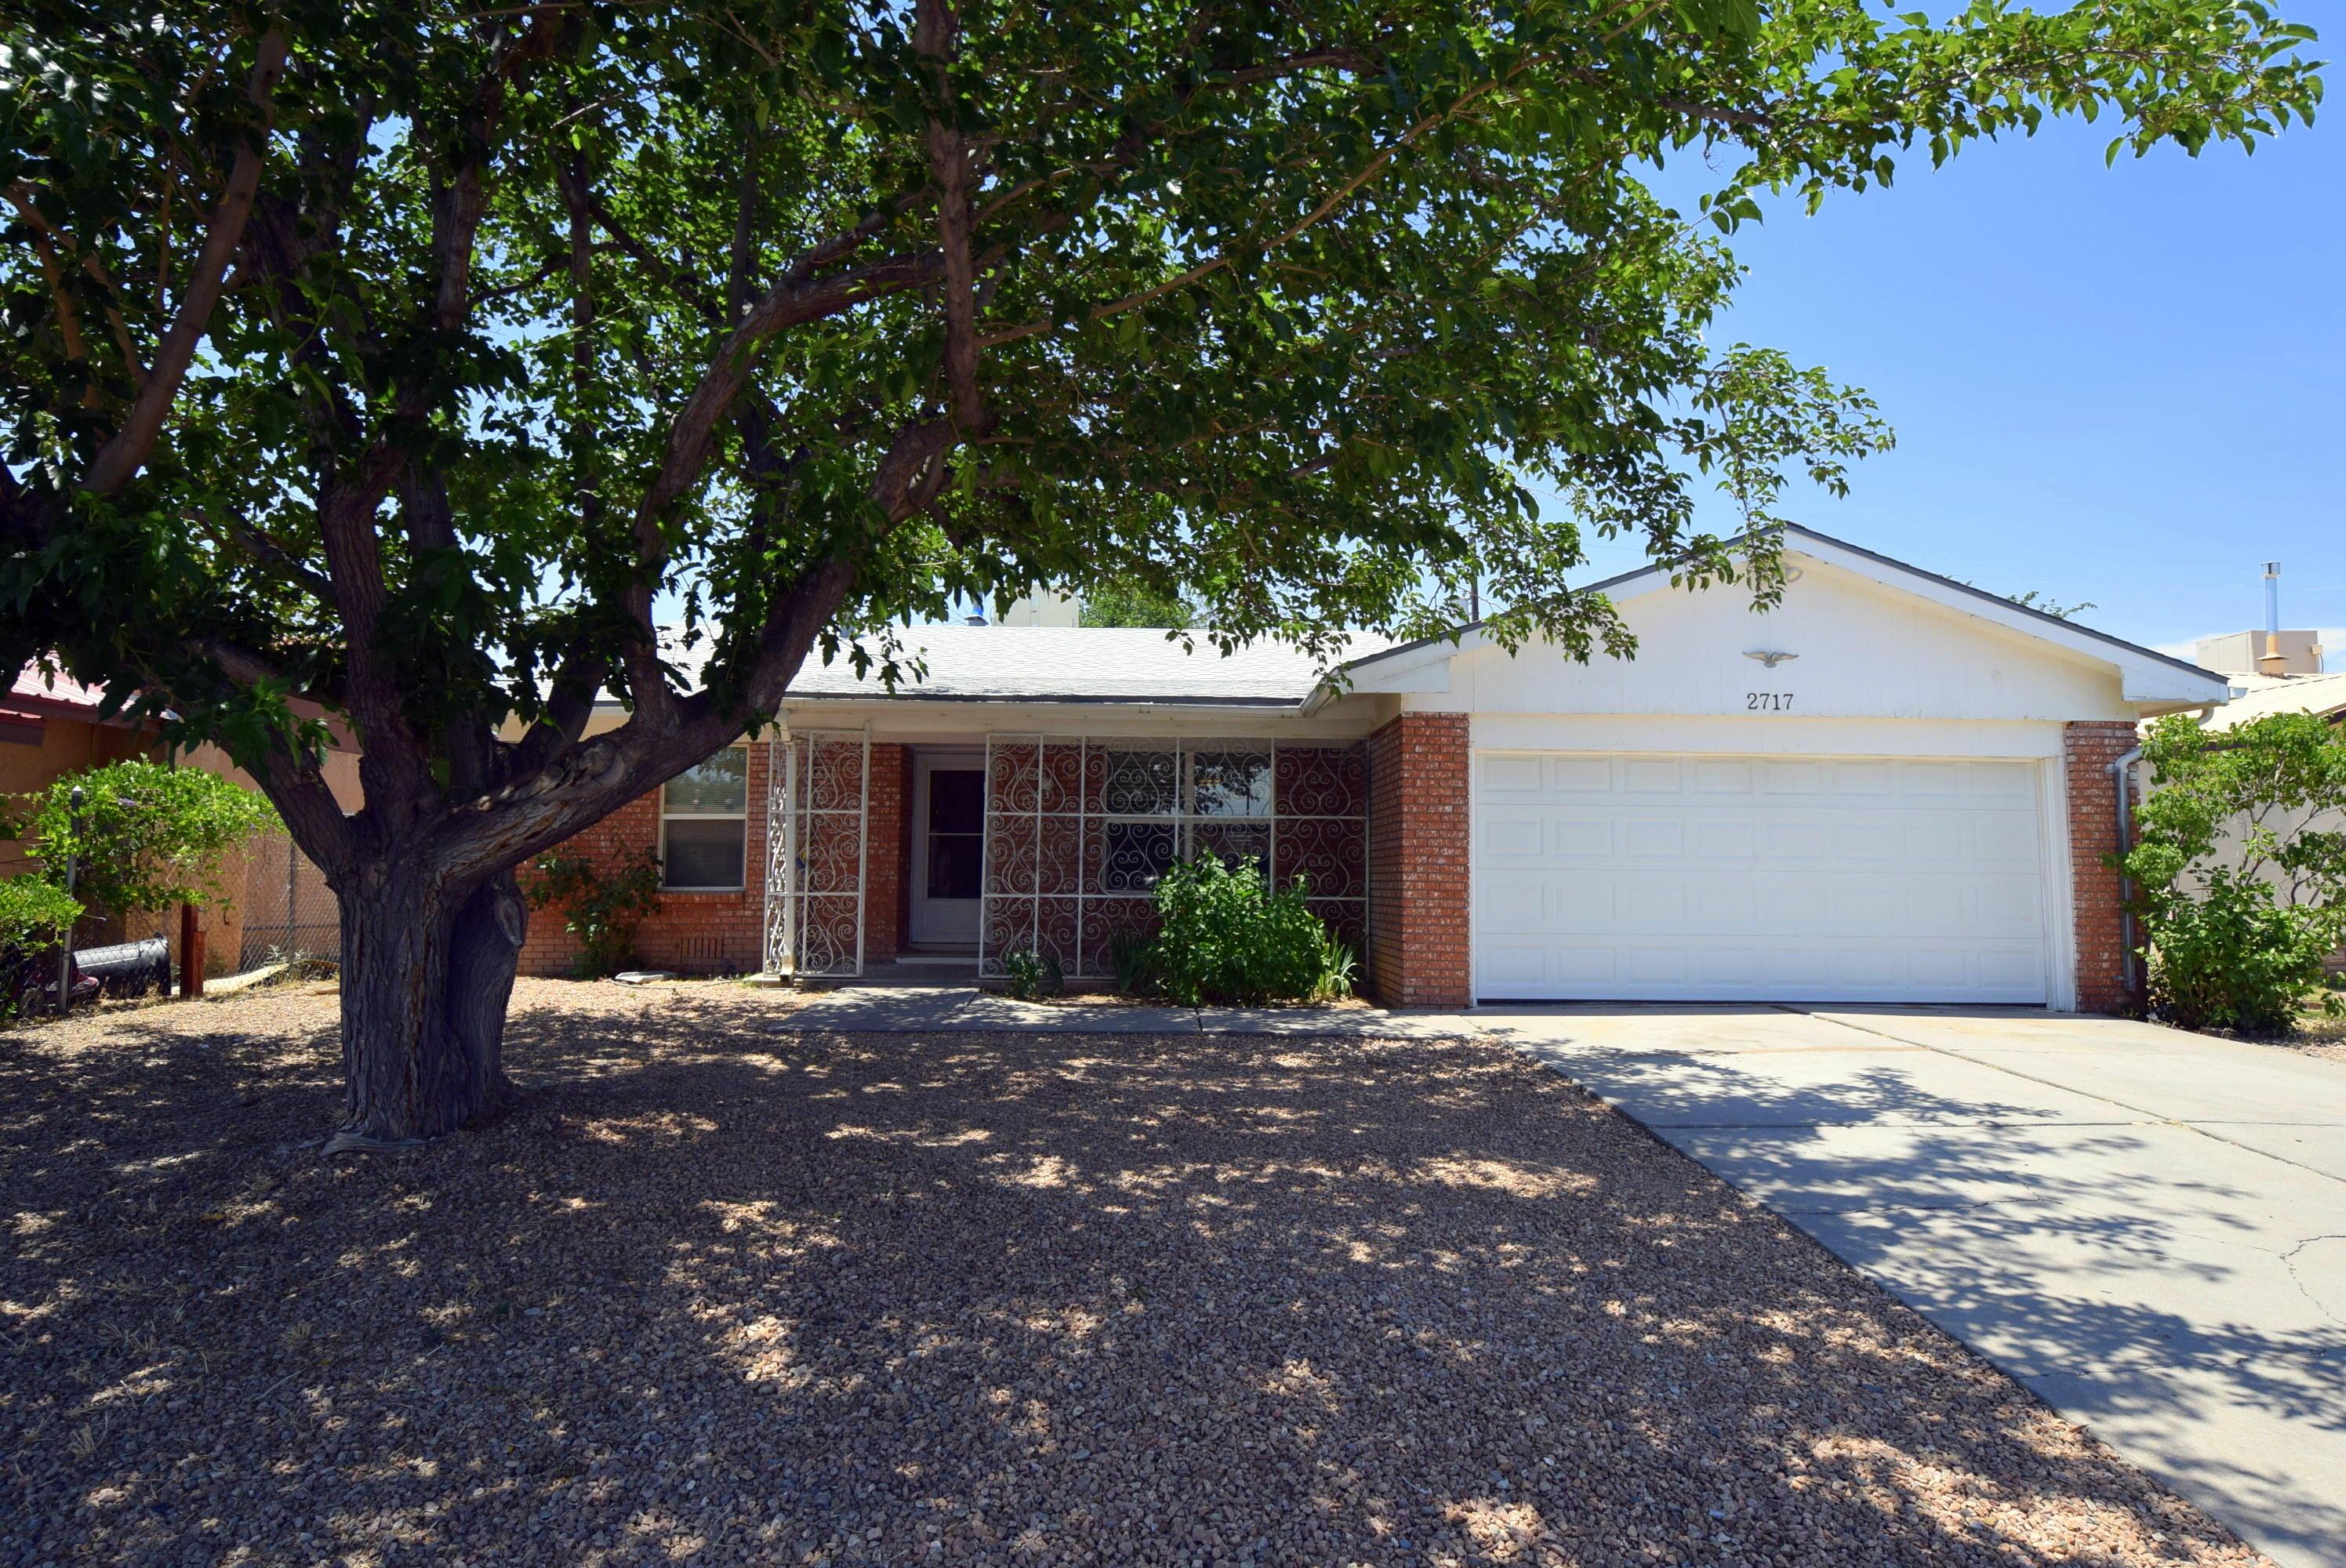 2717 E 19TH Street NW Property Photo - Albuquerque, NM real estate listing